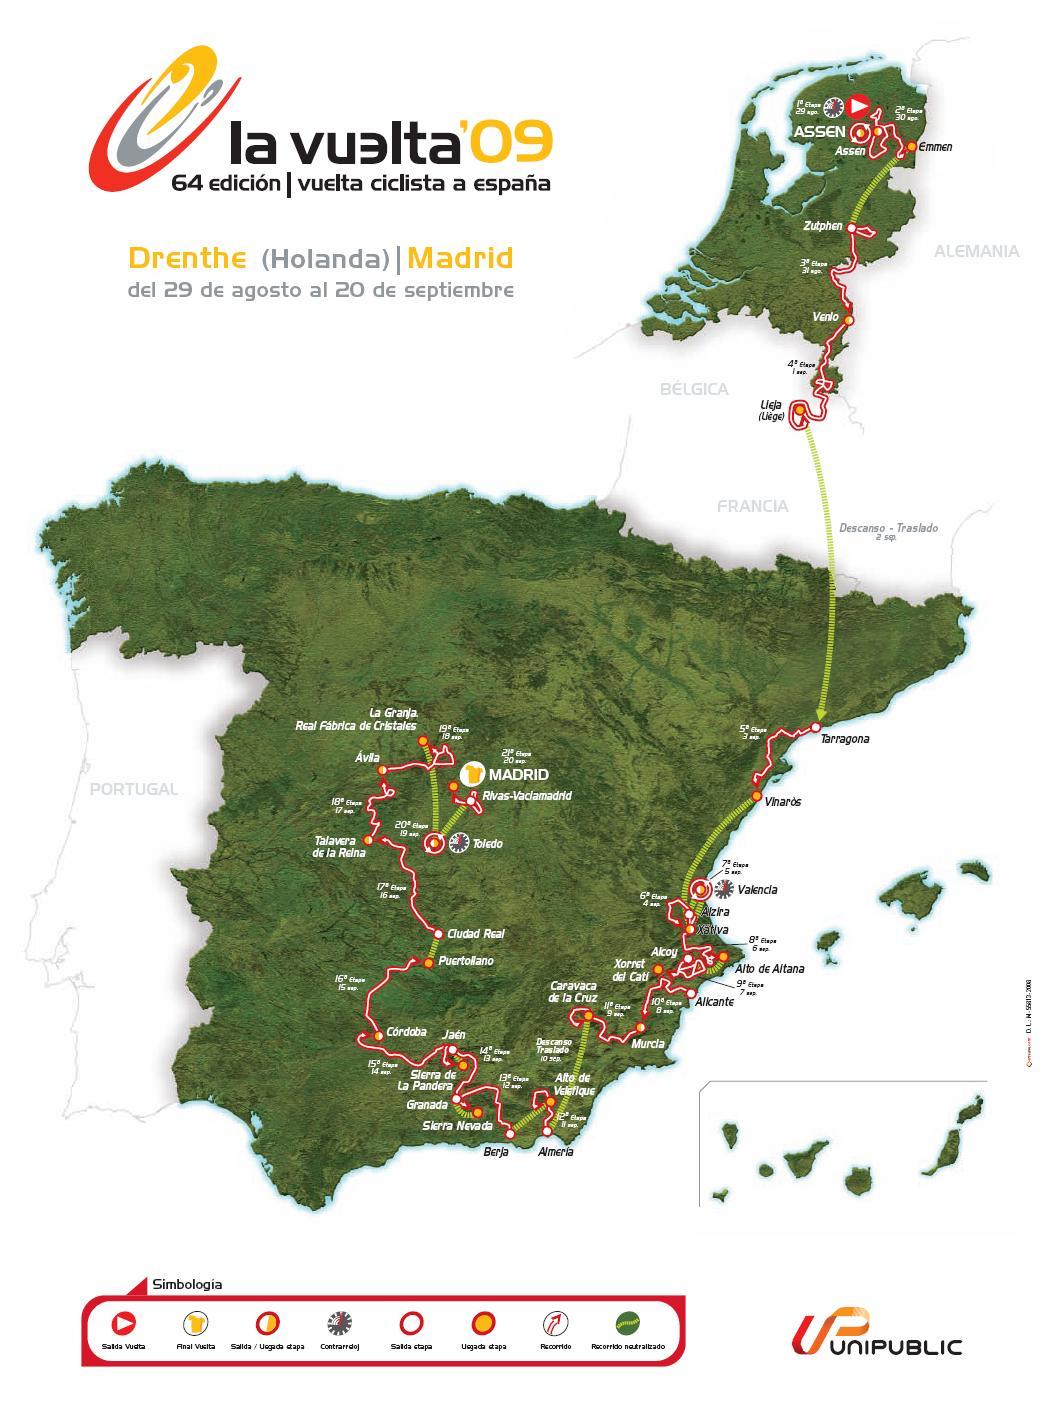 Streckenverlauf Vuelta a España 2009